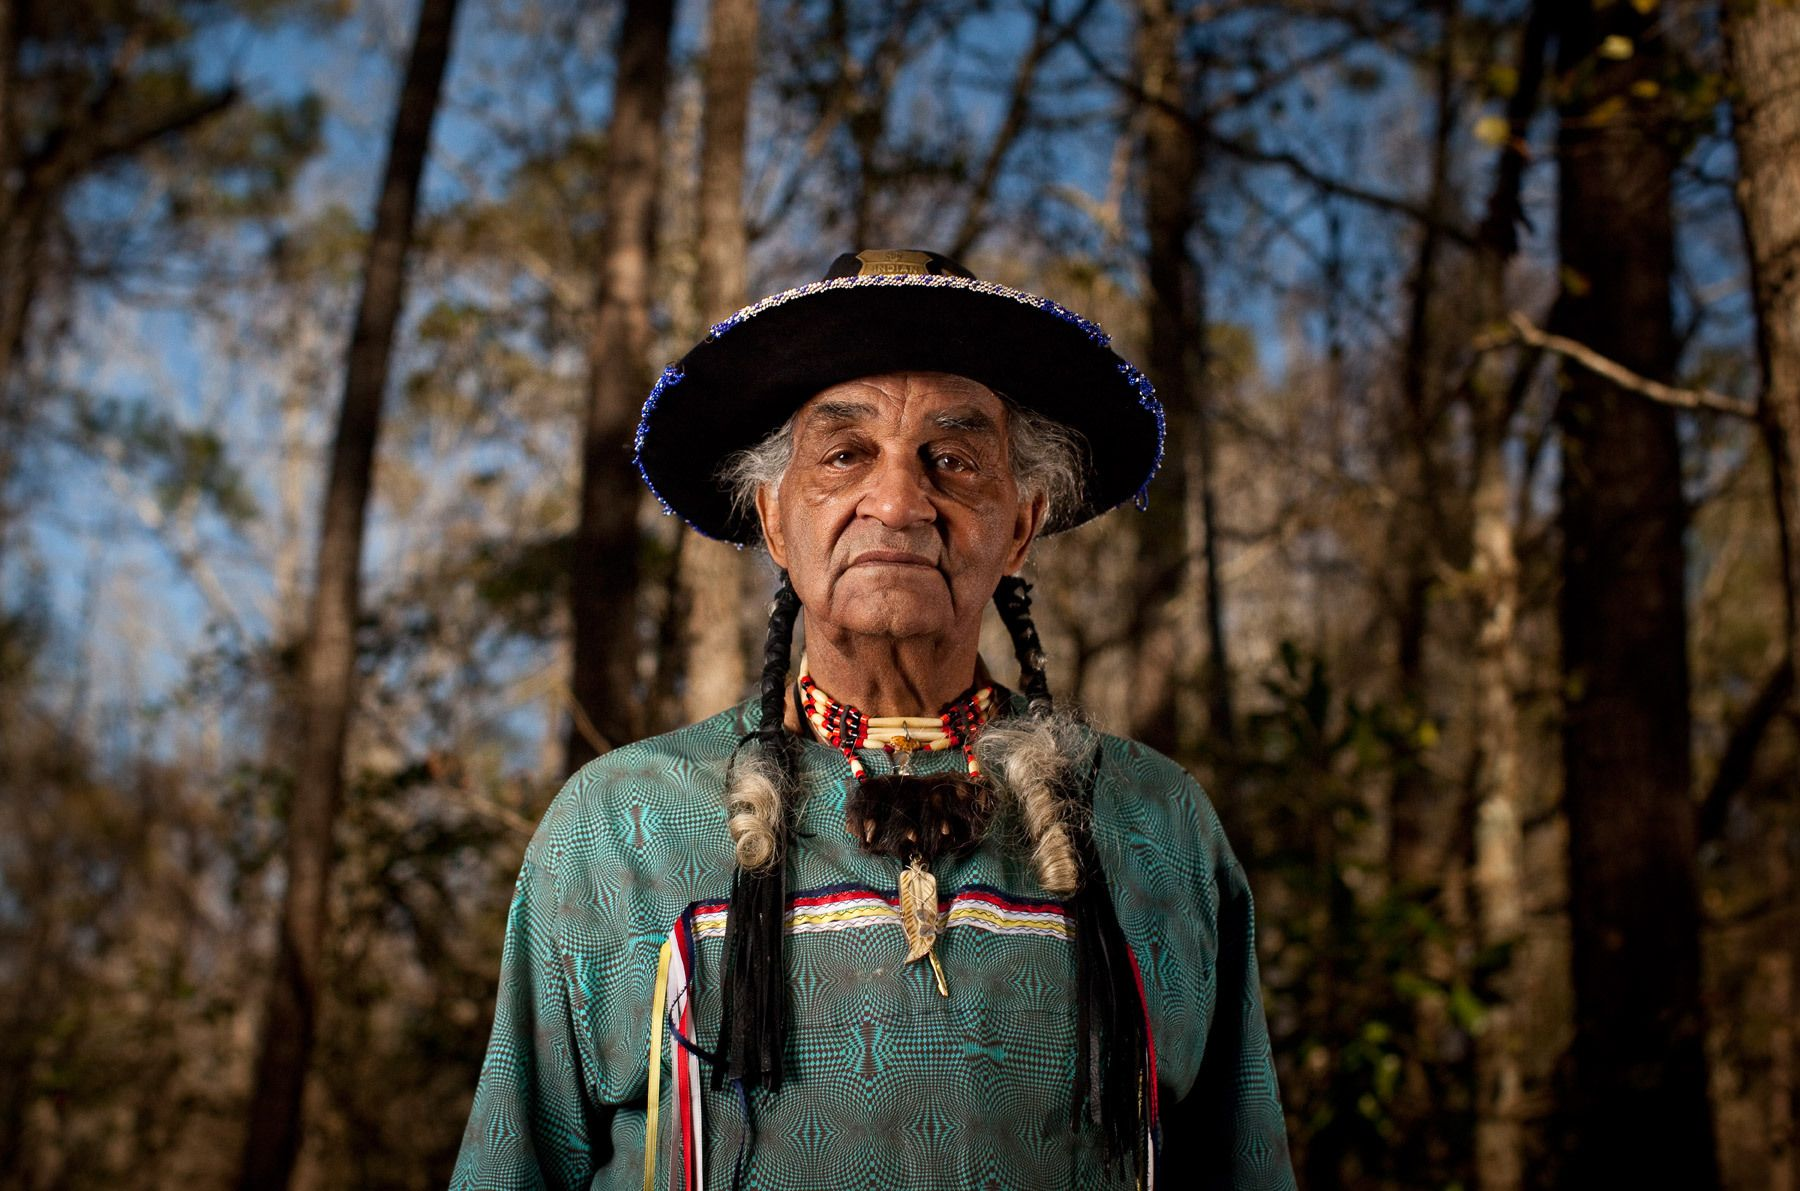 Chief Leon Locklear of the Tuscarora Nation of North Carolina.